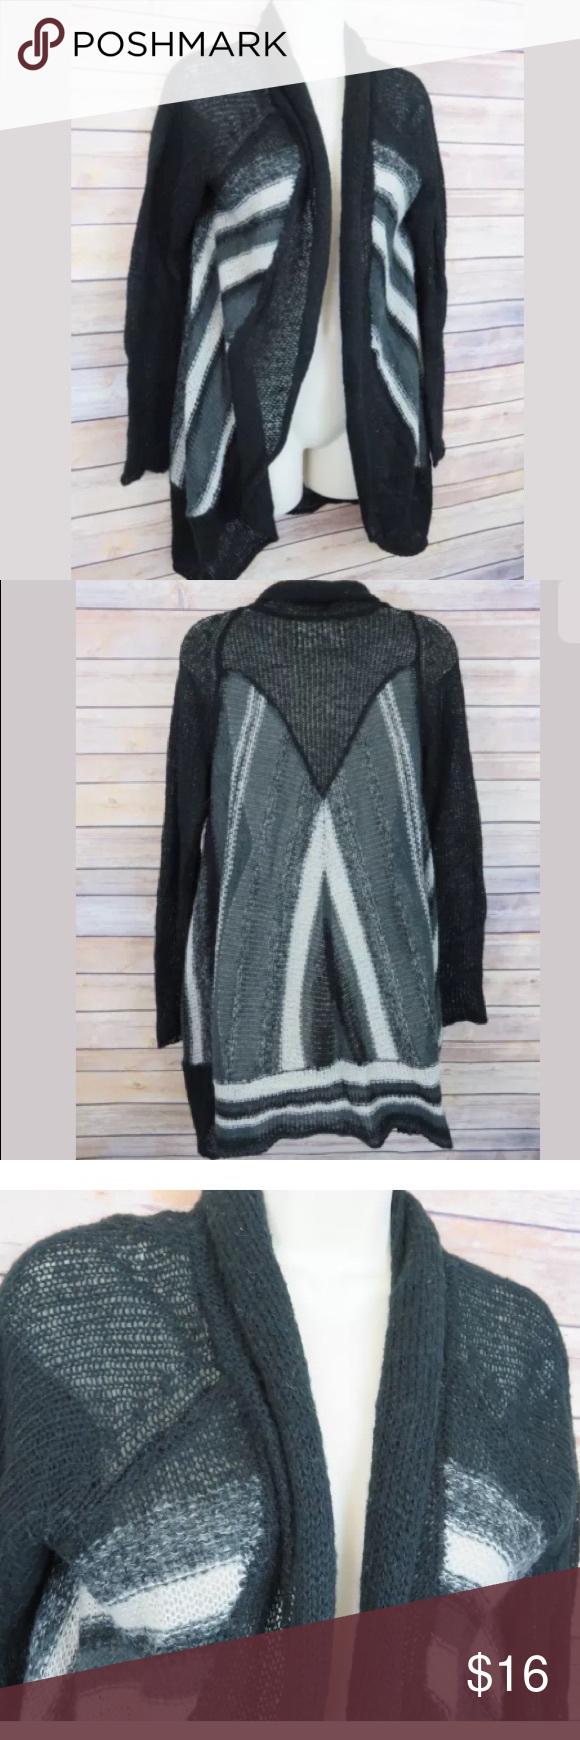 Aventura patterned thin open cardigan sweater Aventura black gray ...